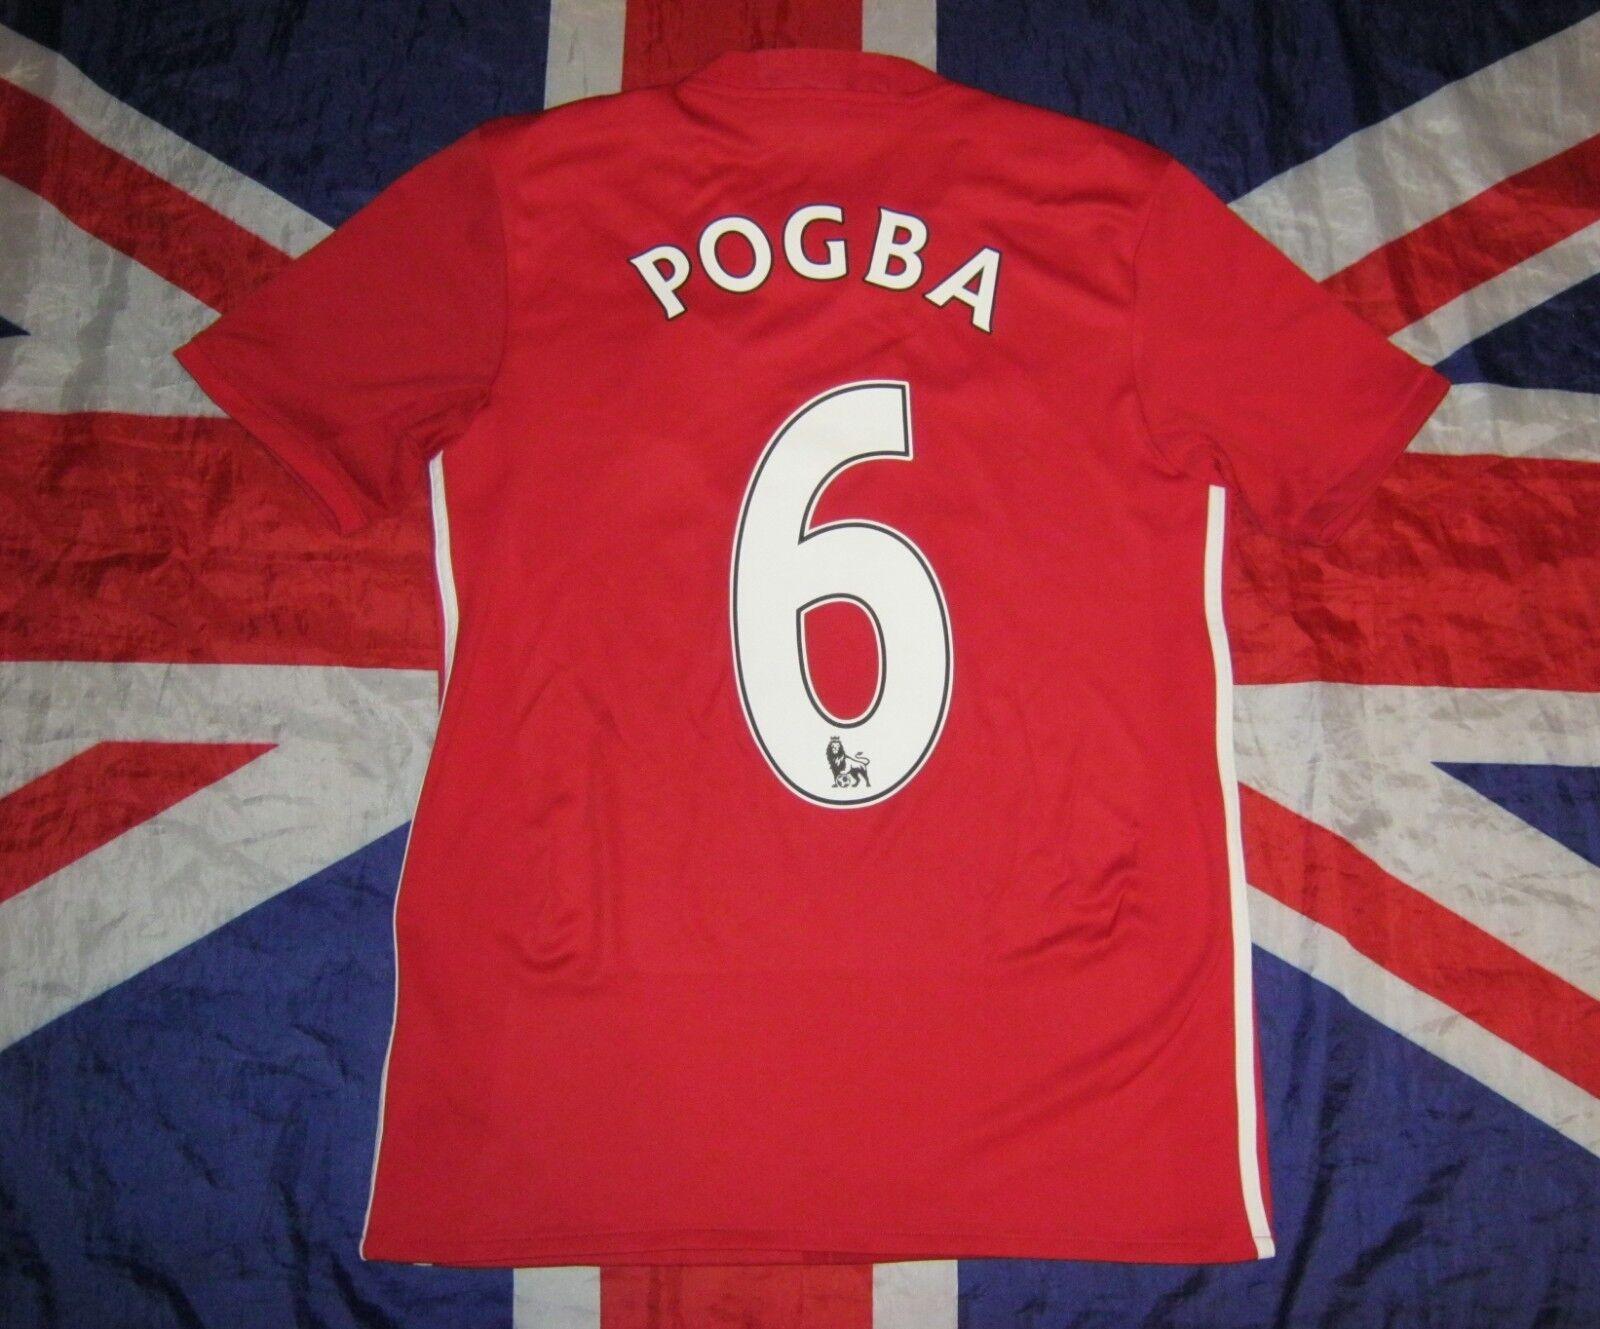 044b14655d2 Manchester United Home Football Shirt 2016 - 2017 Pogba S Jersey Paul  nucbye3195-Men